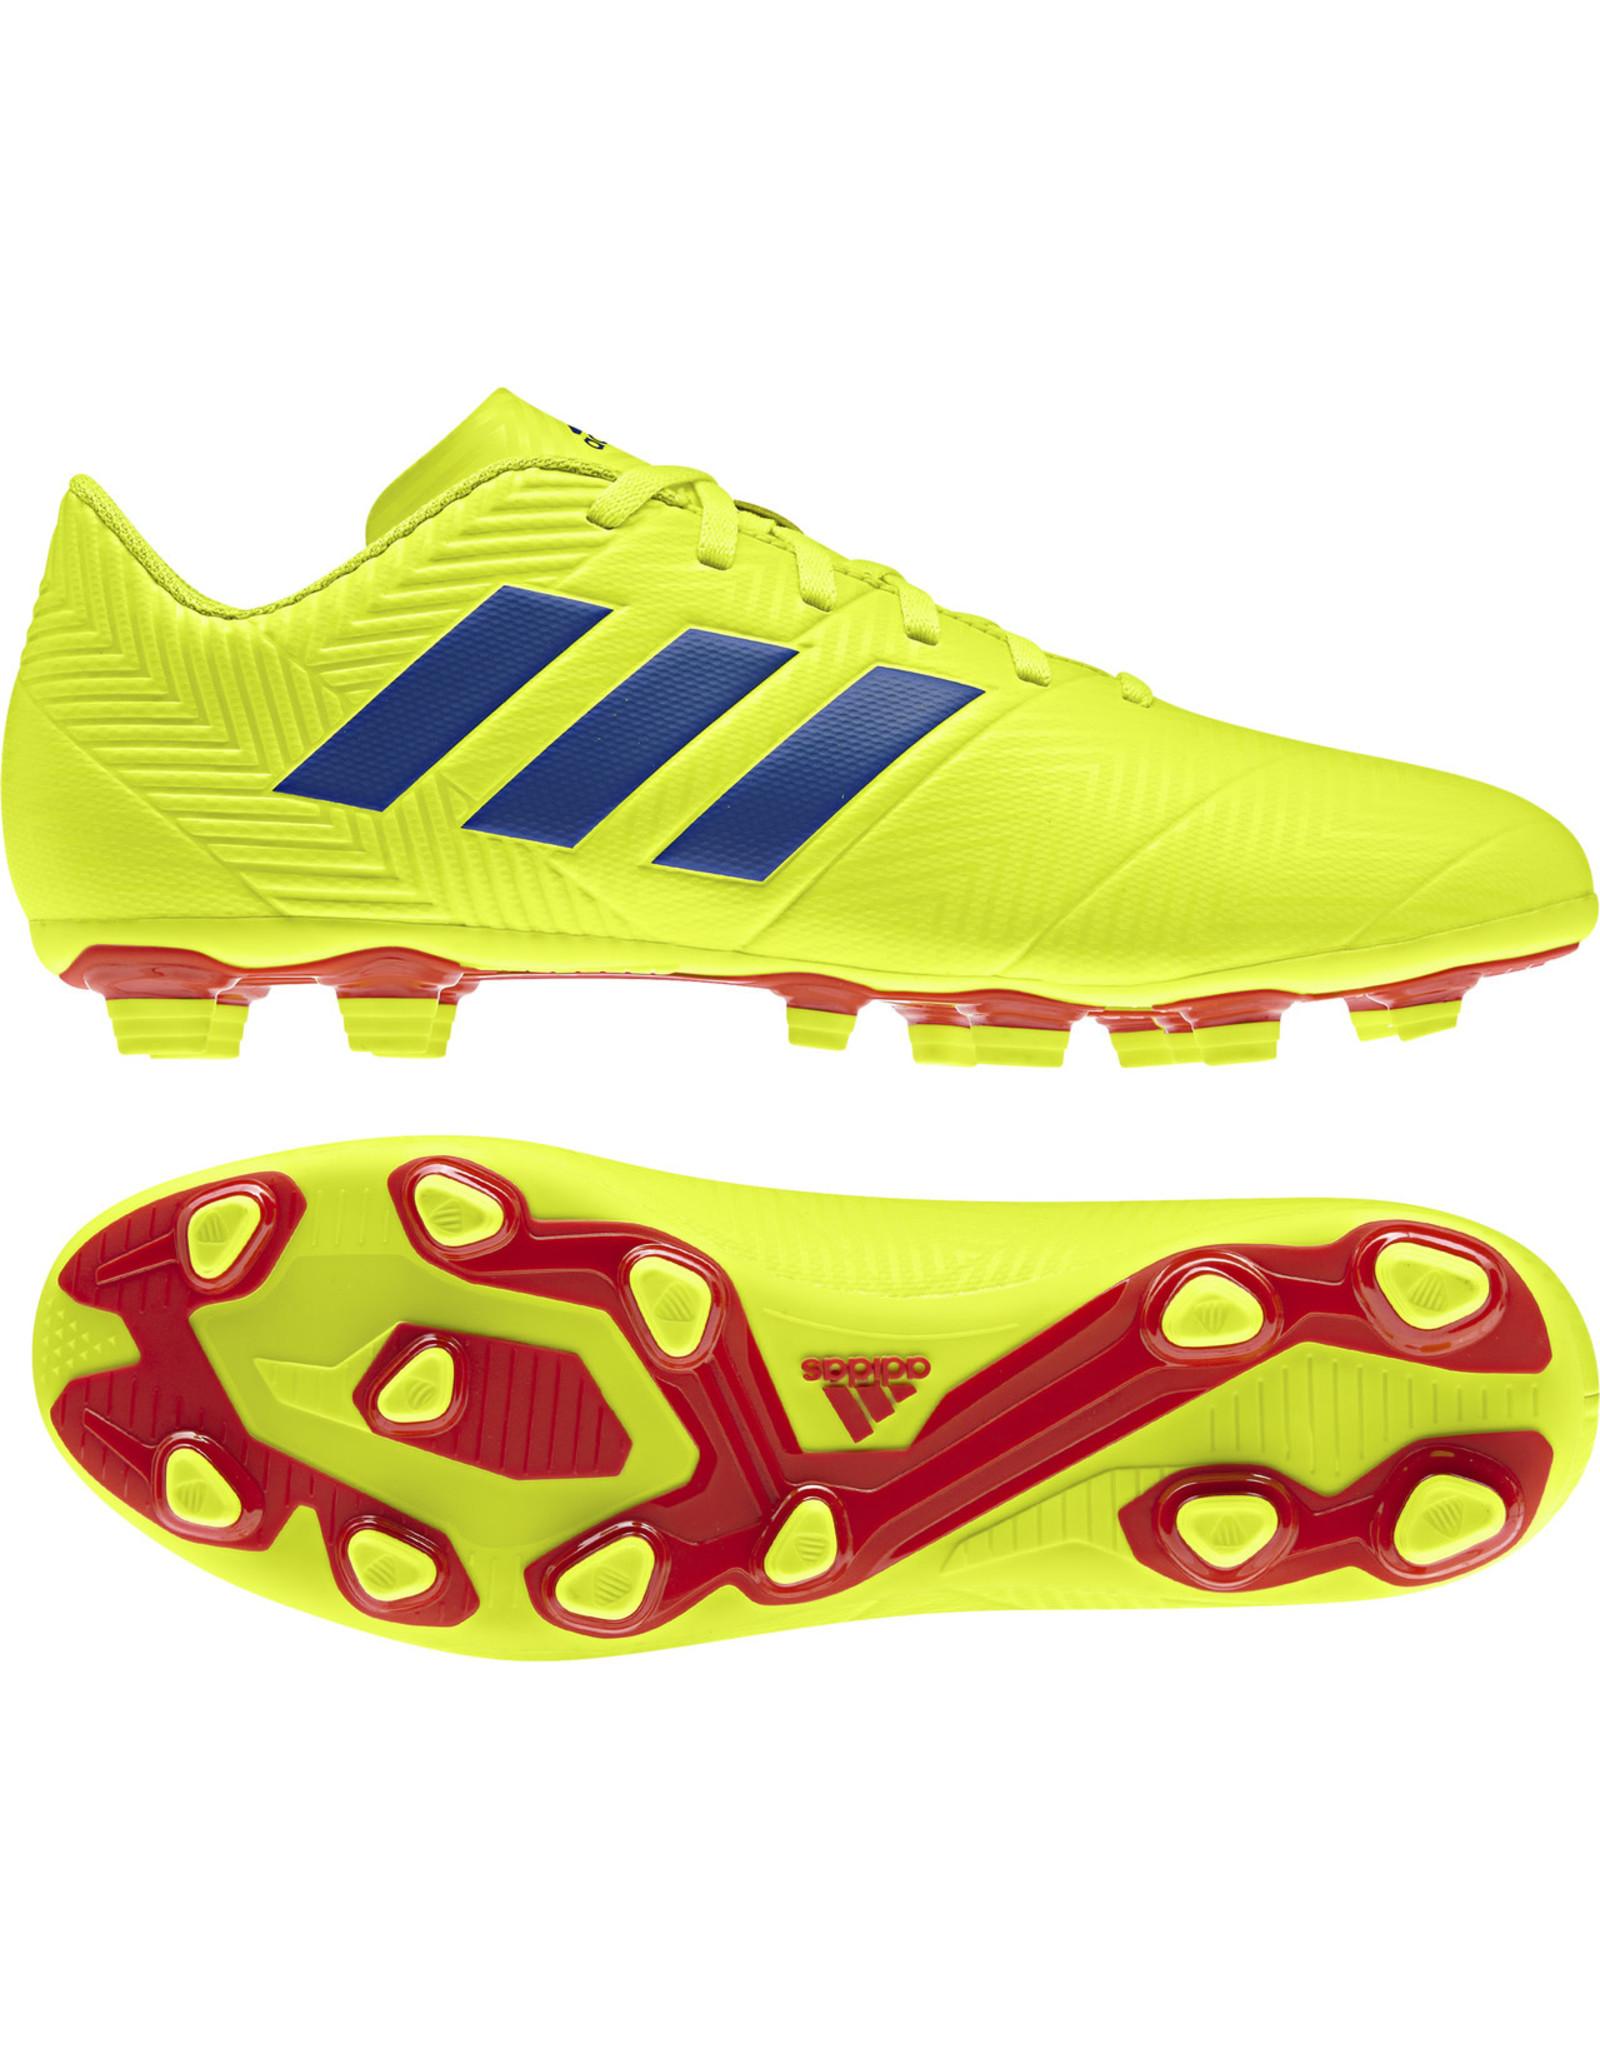 Adidas ADI NEMEZIZ 18.4 FxG (Solar Yellow/Football Blue/Active Red)